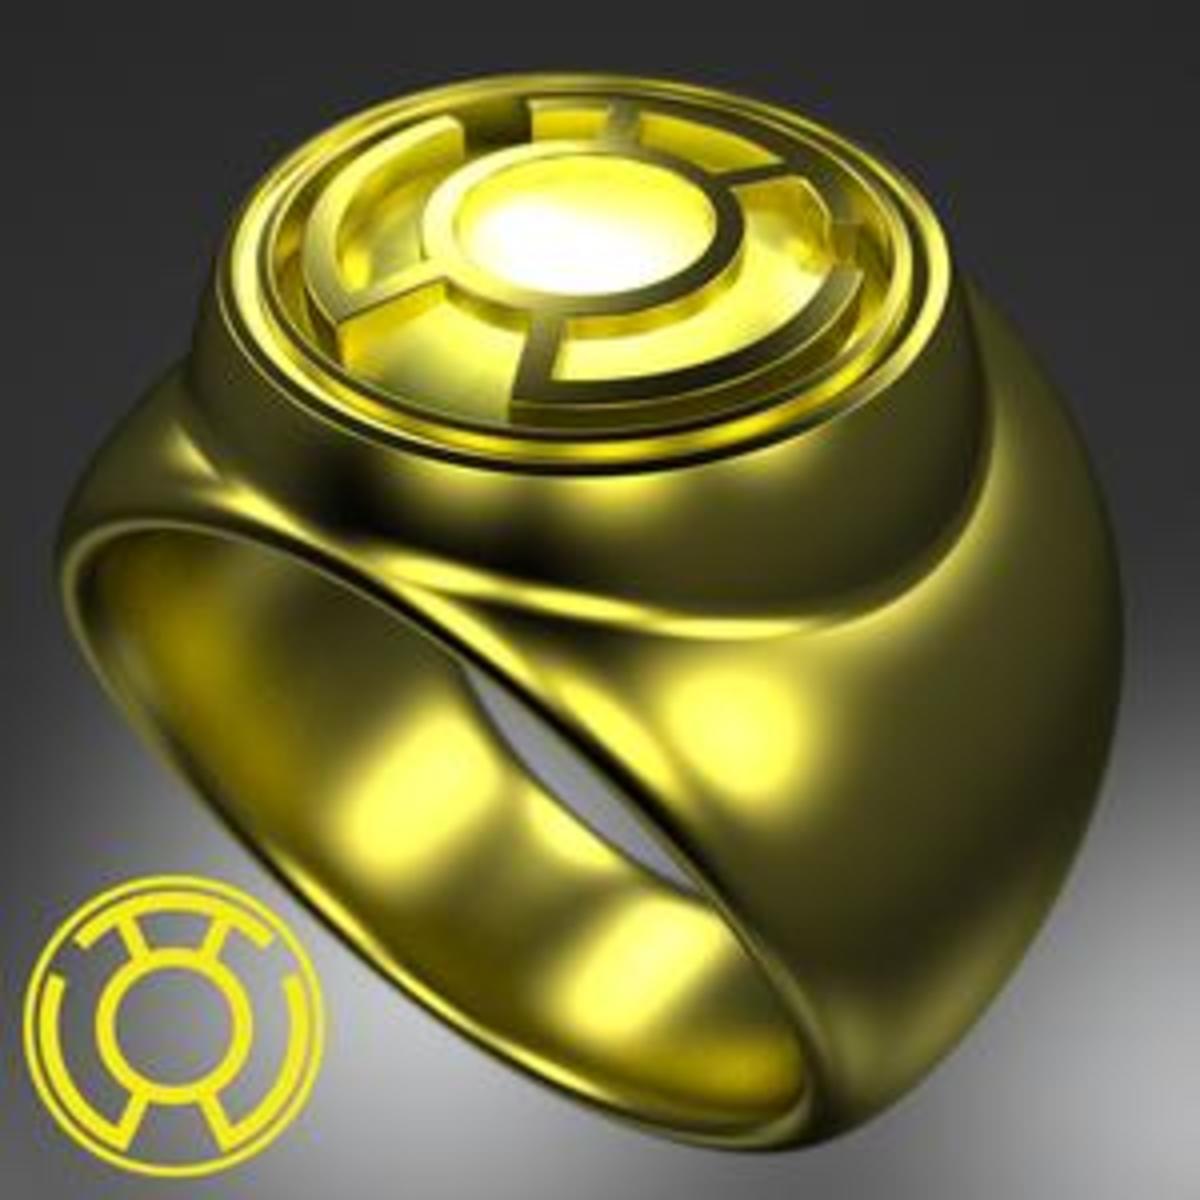 Green Lantern Corps Power Rings. Long Finger Engagement Rings. Sqaure Wedding Rings. Squoval Engagement Rings. Tough Wedding Rings. Symbolic Wedding Rings. Swim Rings. Timber Wedding Rings. Glass Engagement Rings